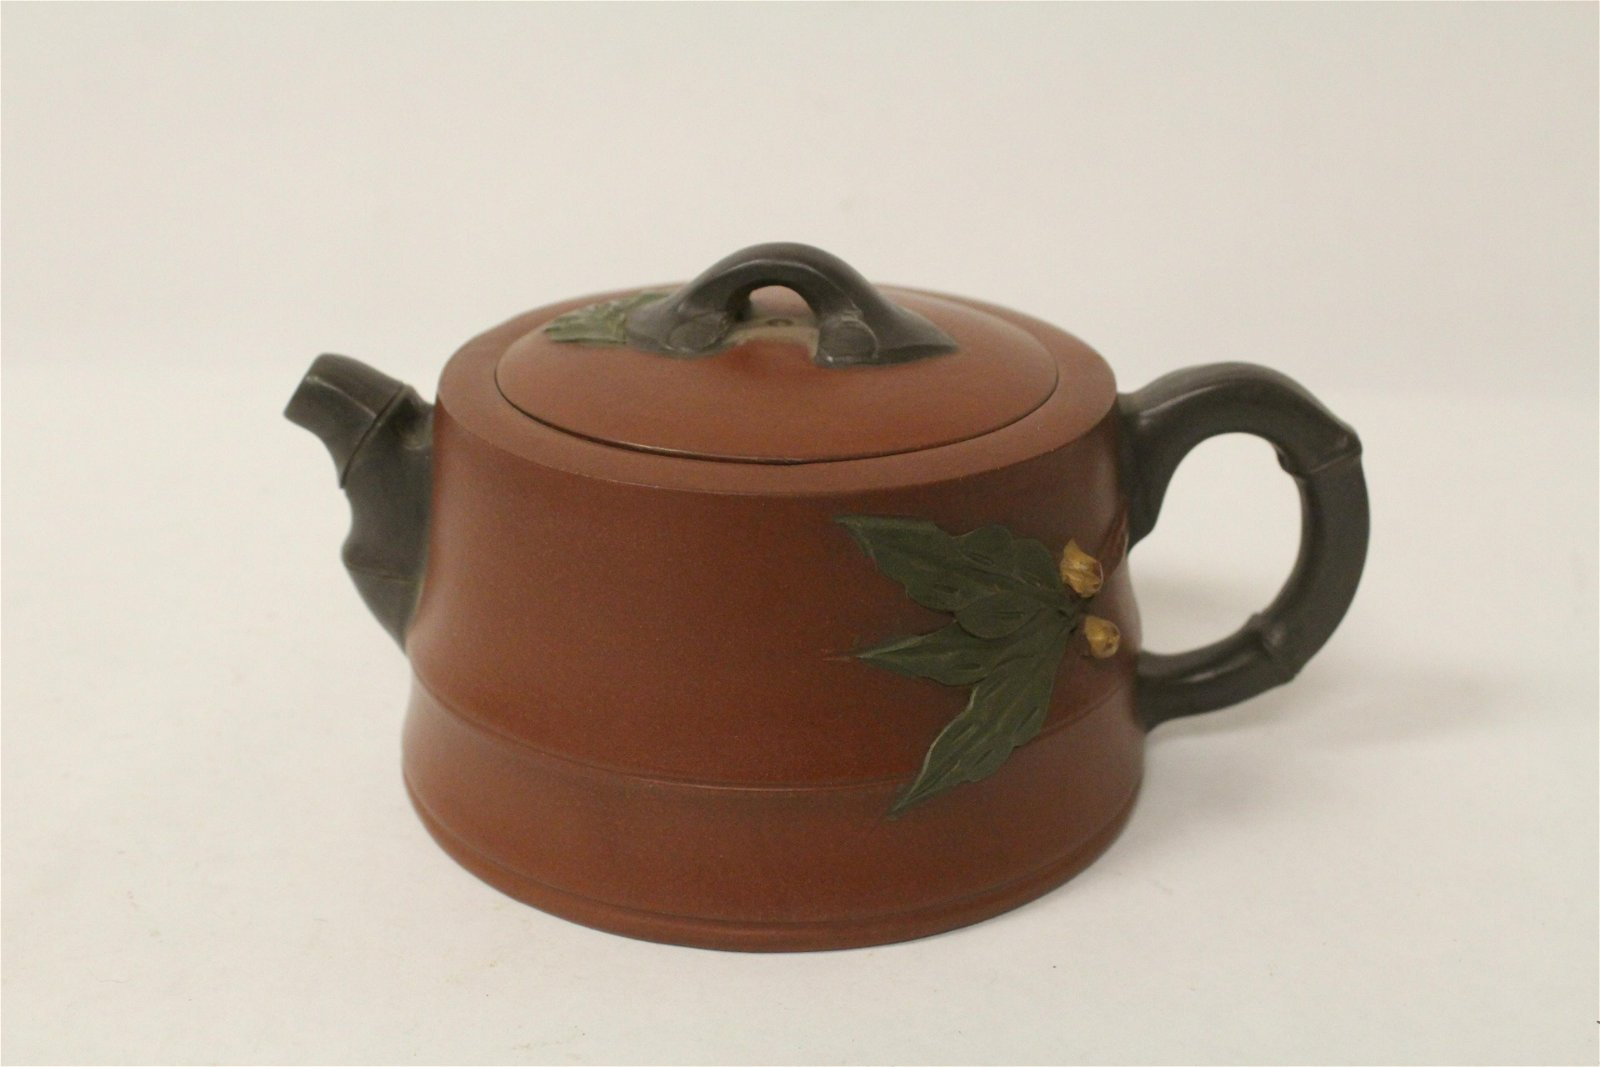 A fine Chinese Yixing teapot